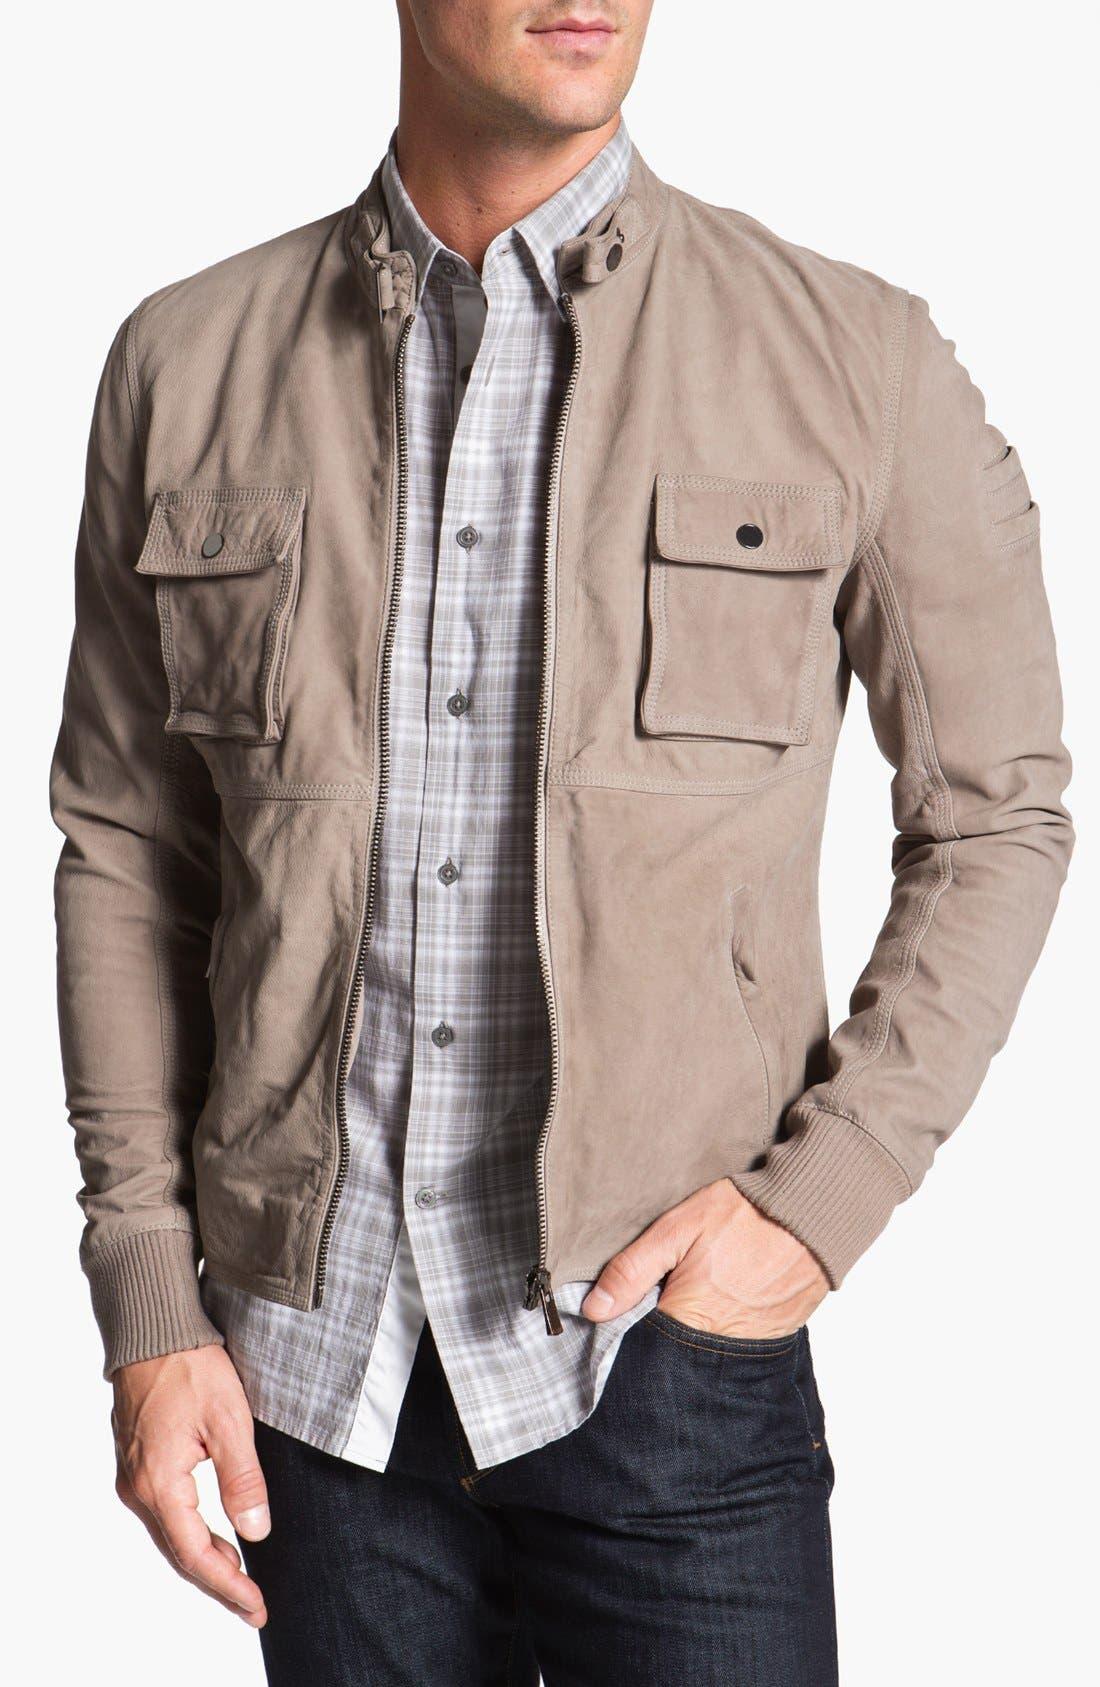 Main Image - La Marque Nubuck Leather Biker Jacket